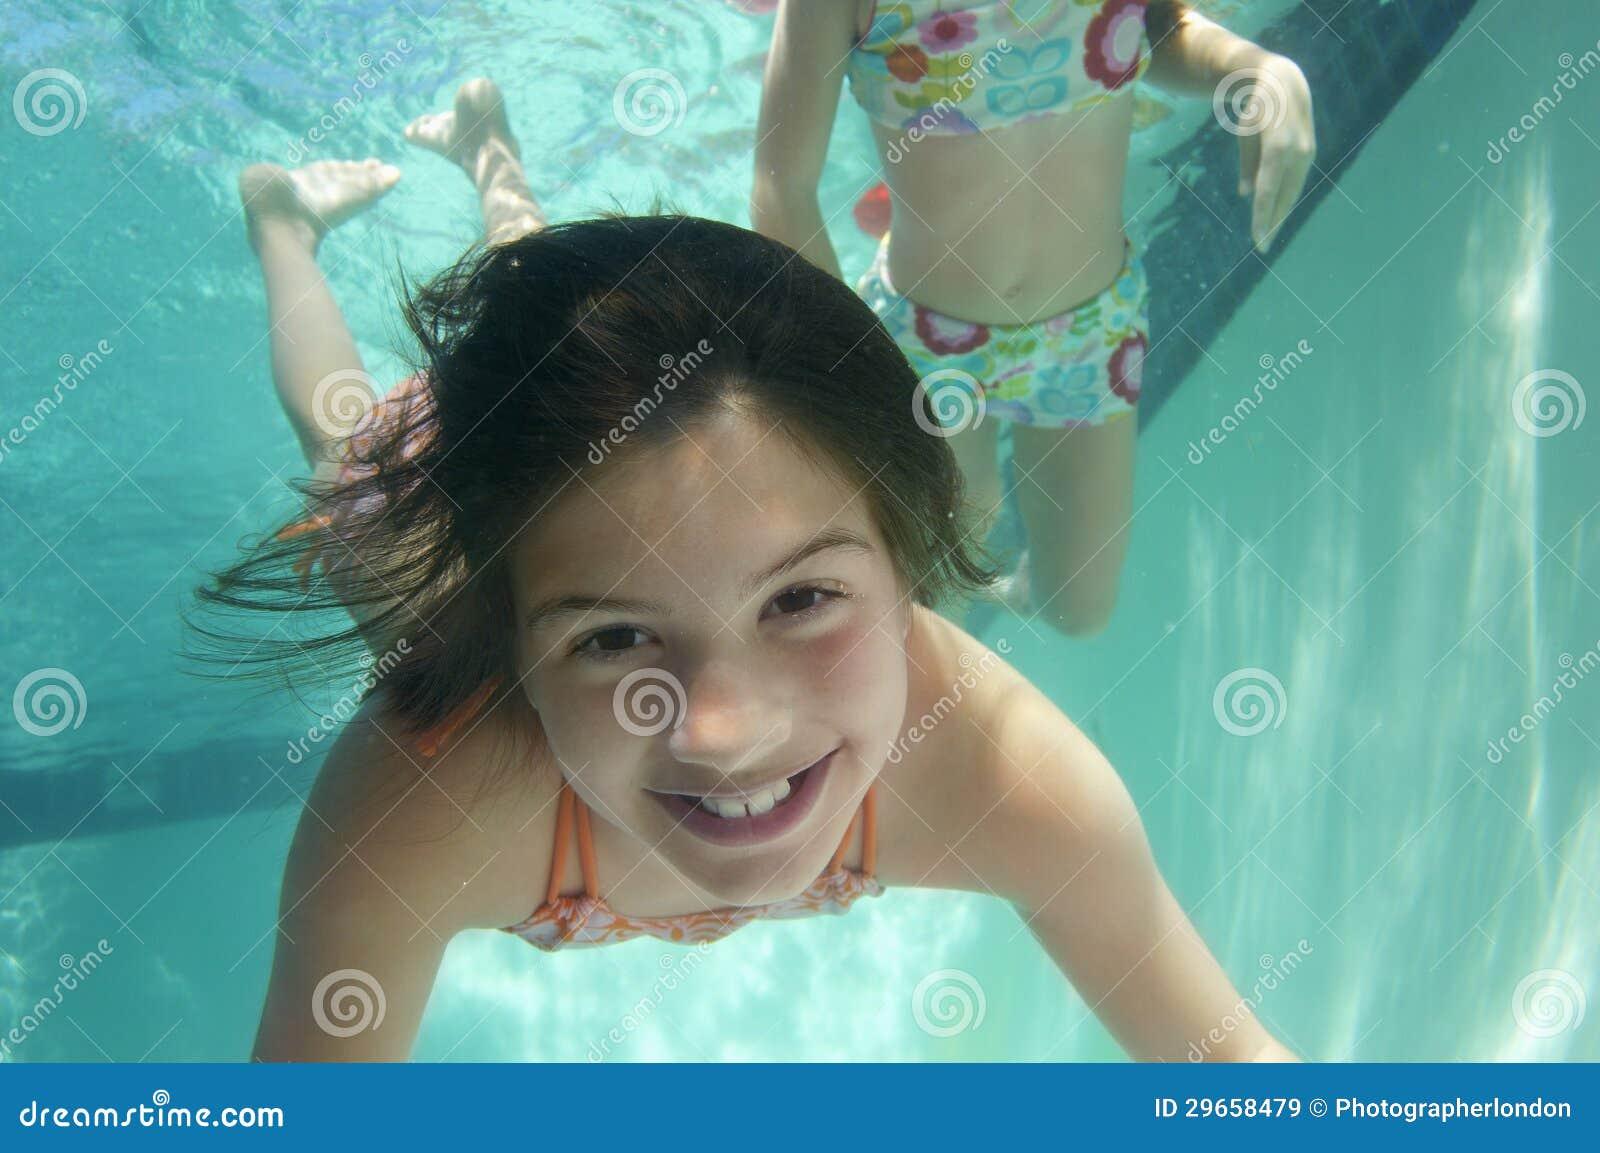 tumblr teen nudes boy and girls